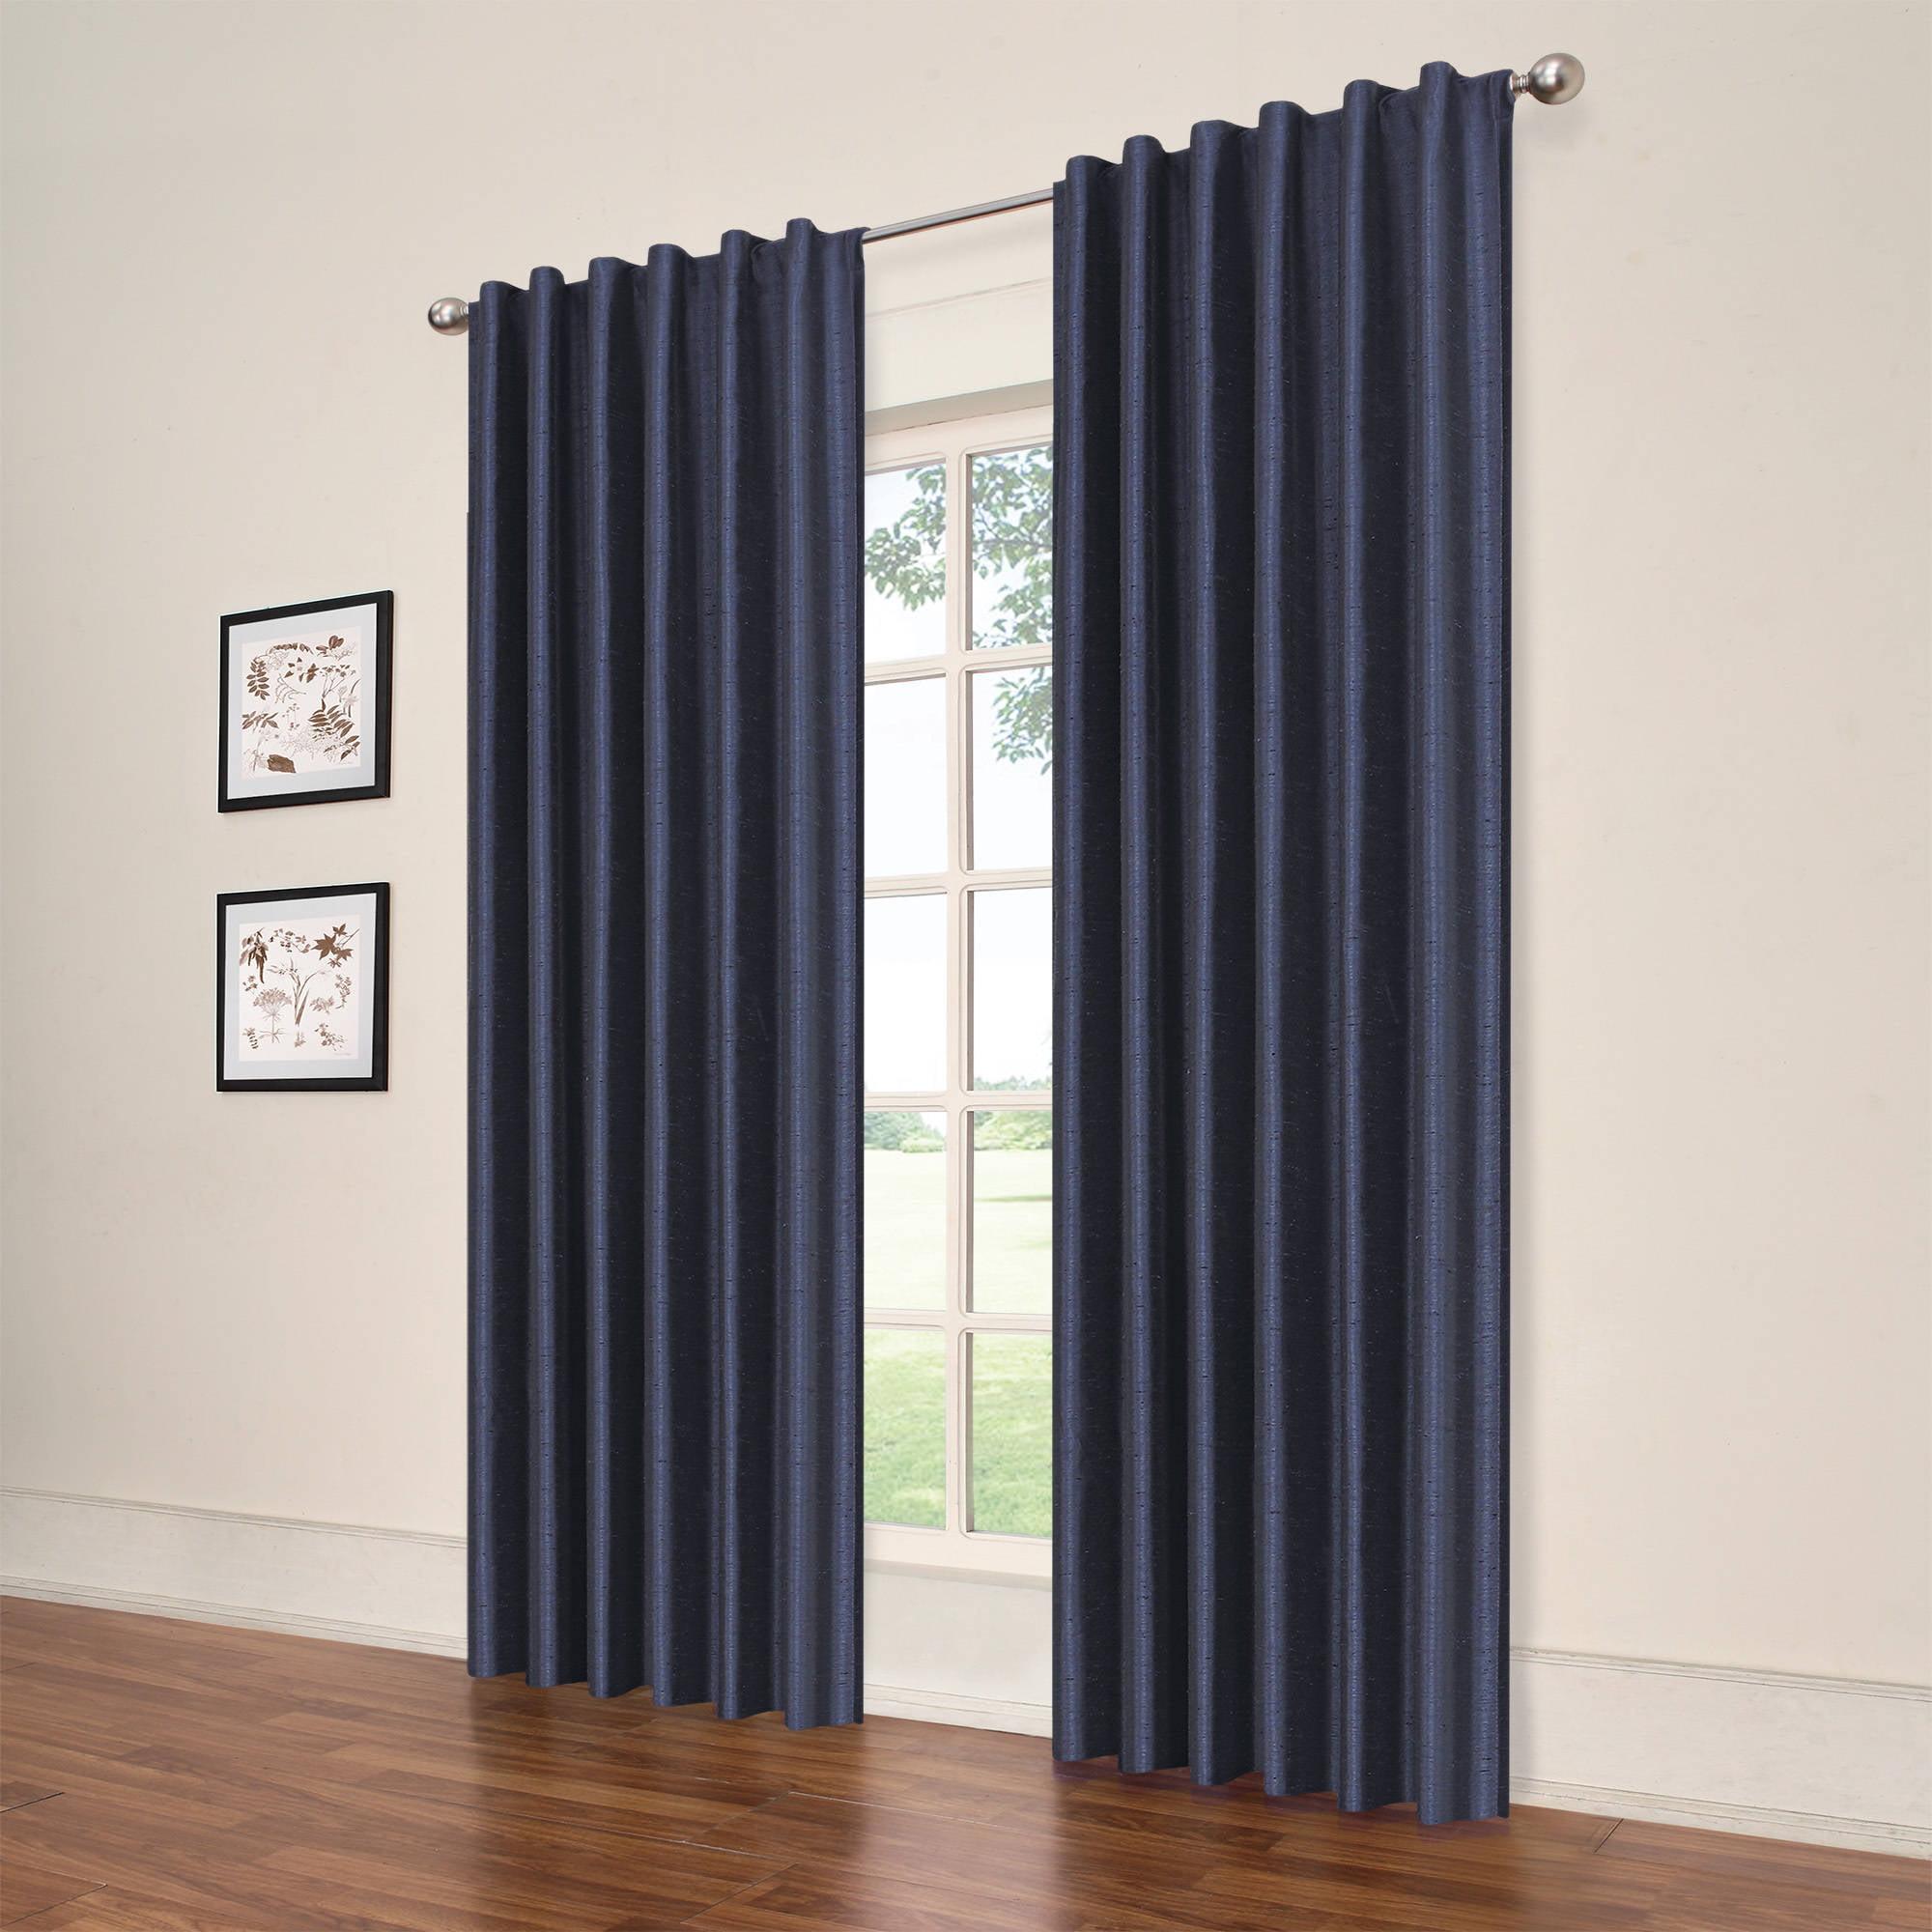 Eclipse Symphony Blackout Window Curtain Panel - Walmart.com for Black Curtains Texture  174mzq